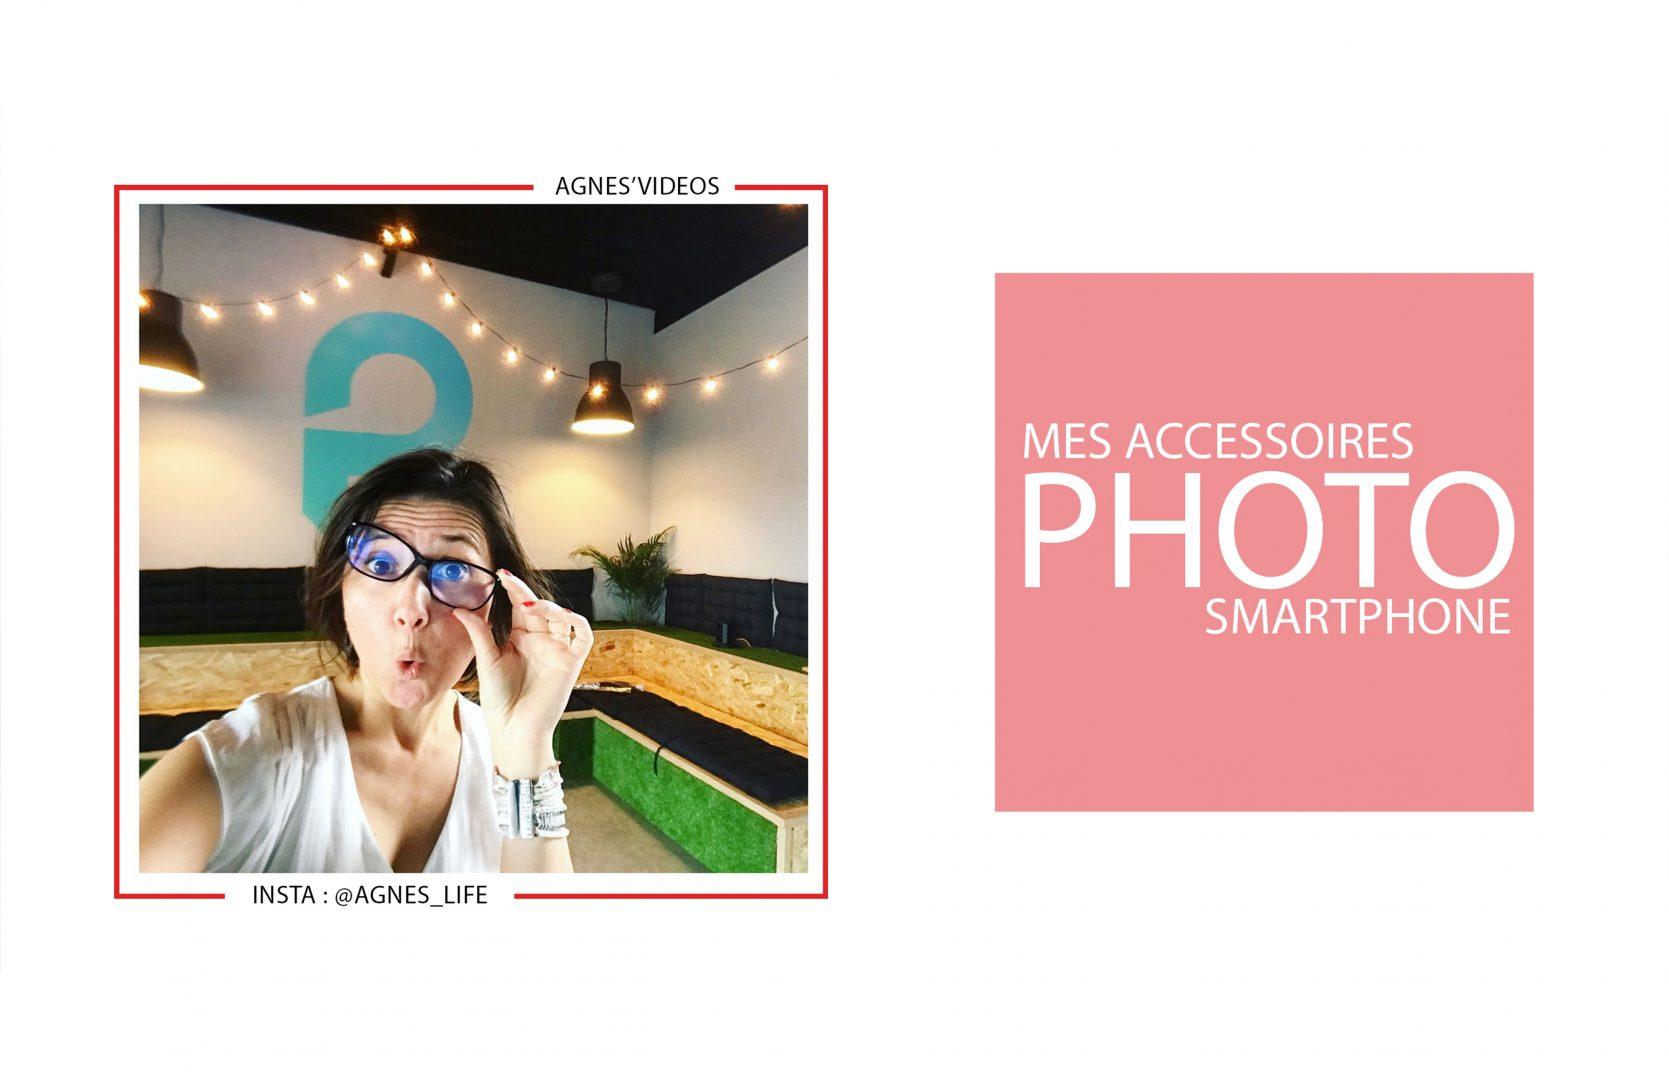 accessoire-photo-smartphone